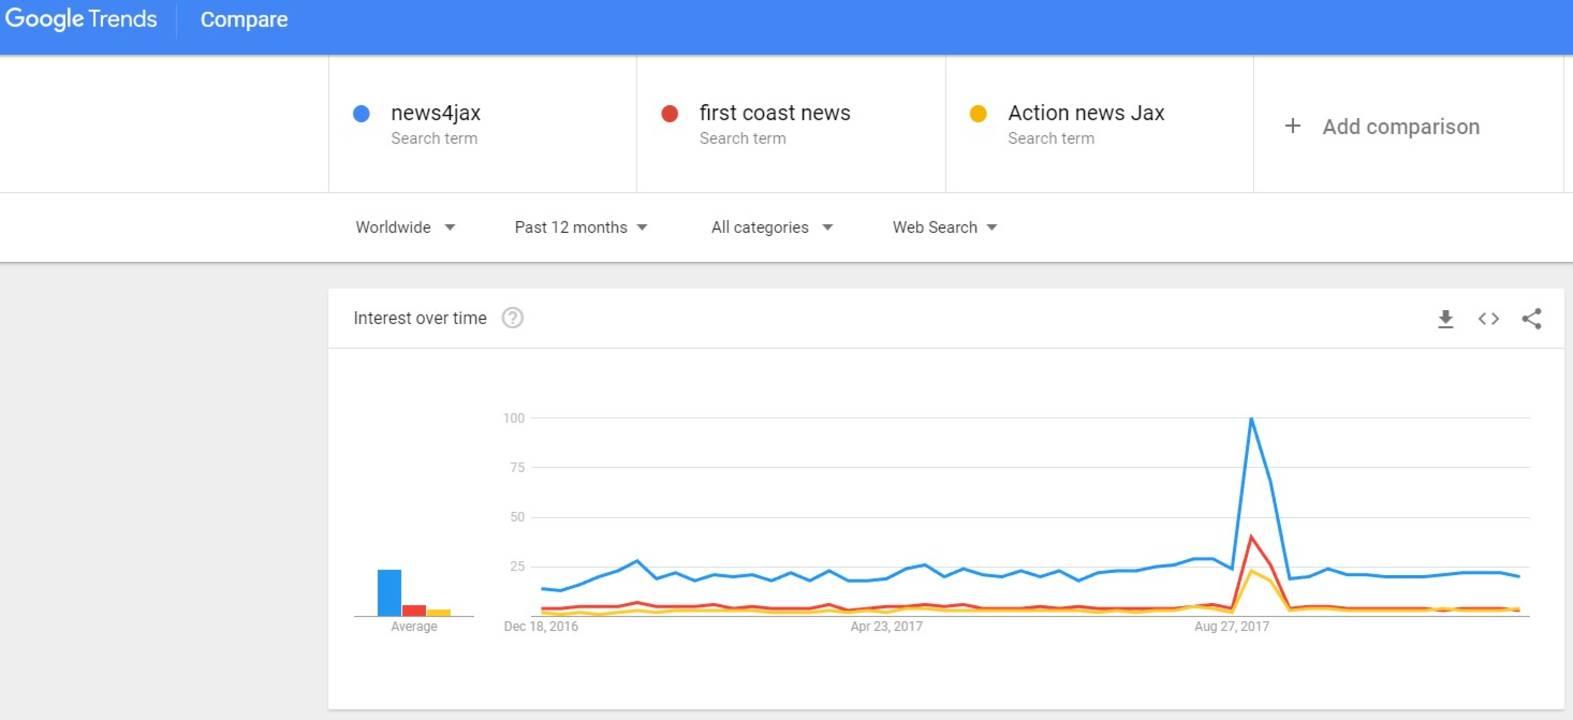 compare trends_1513190136577.jpg